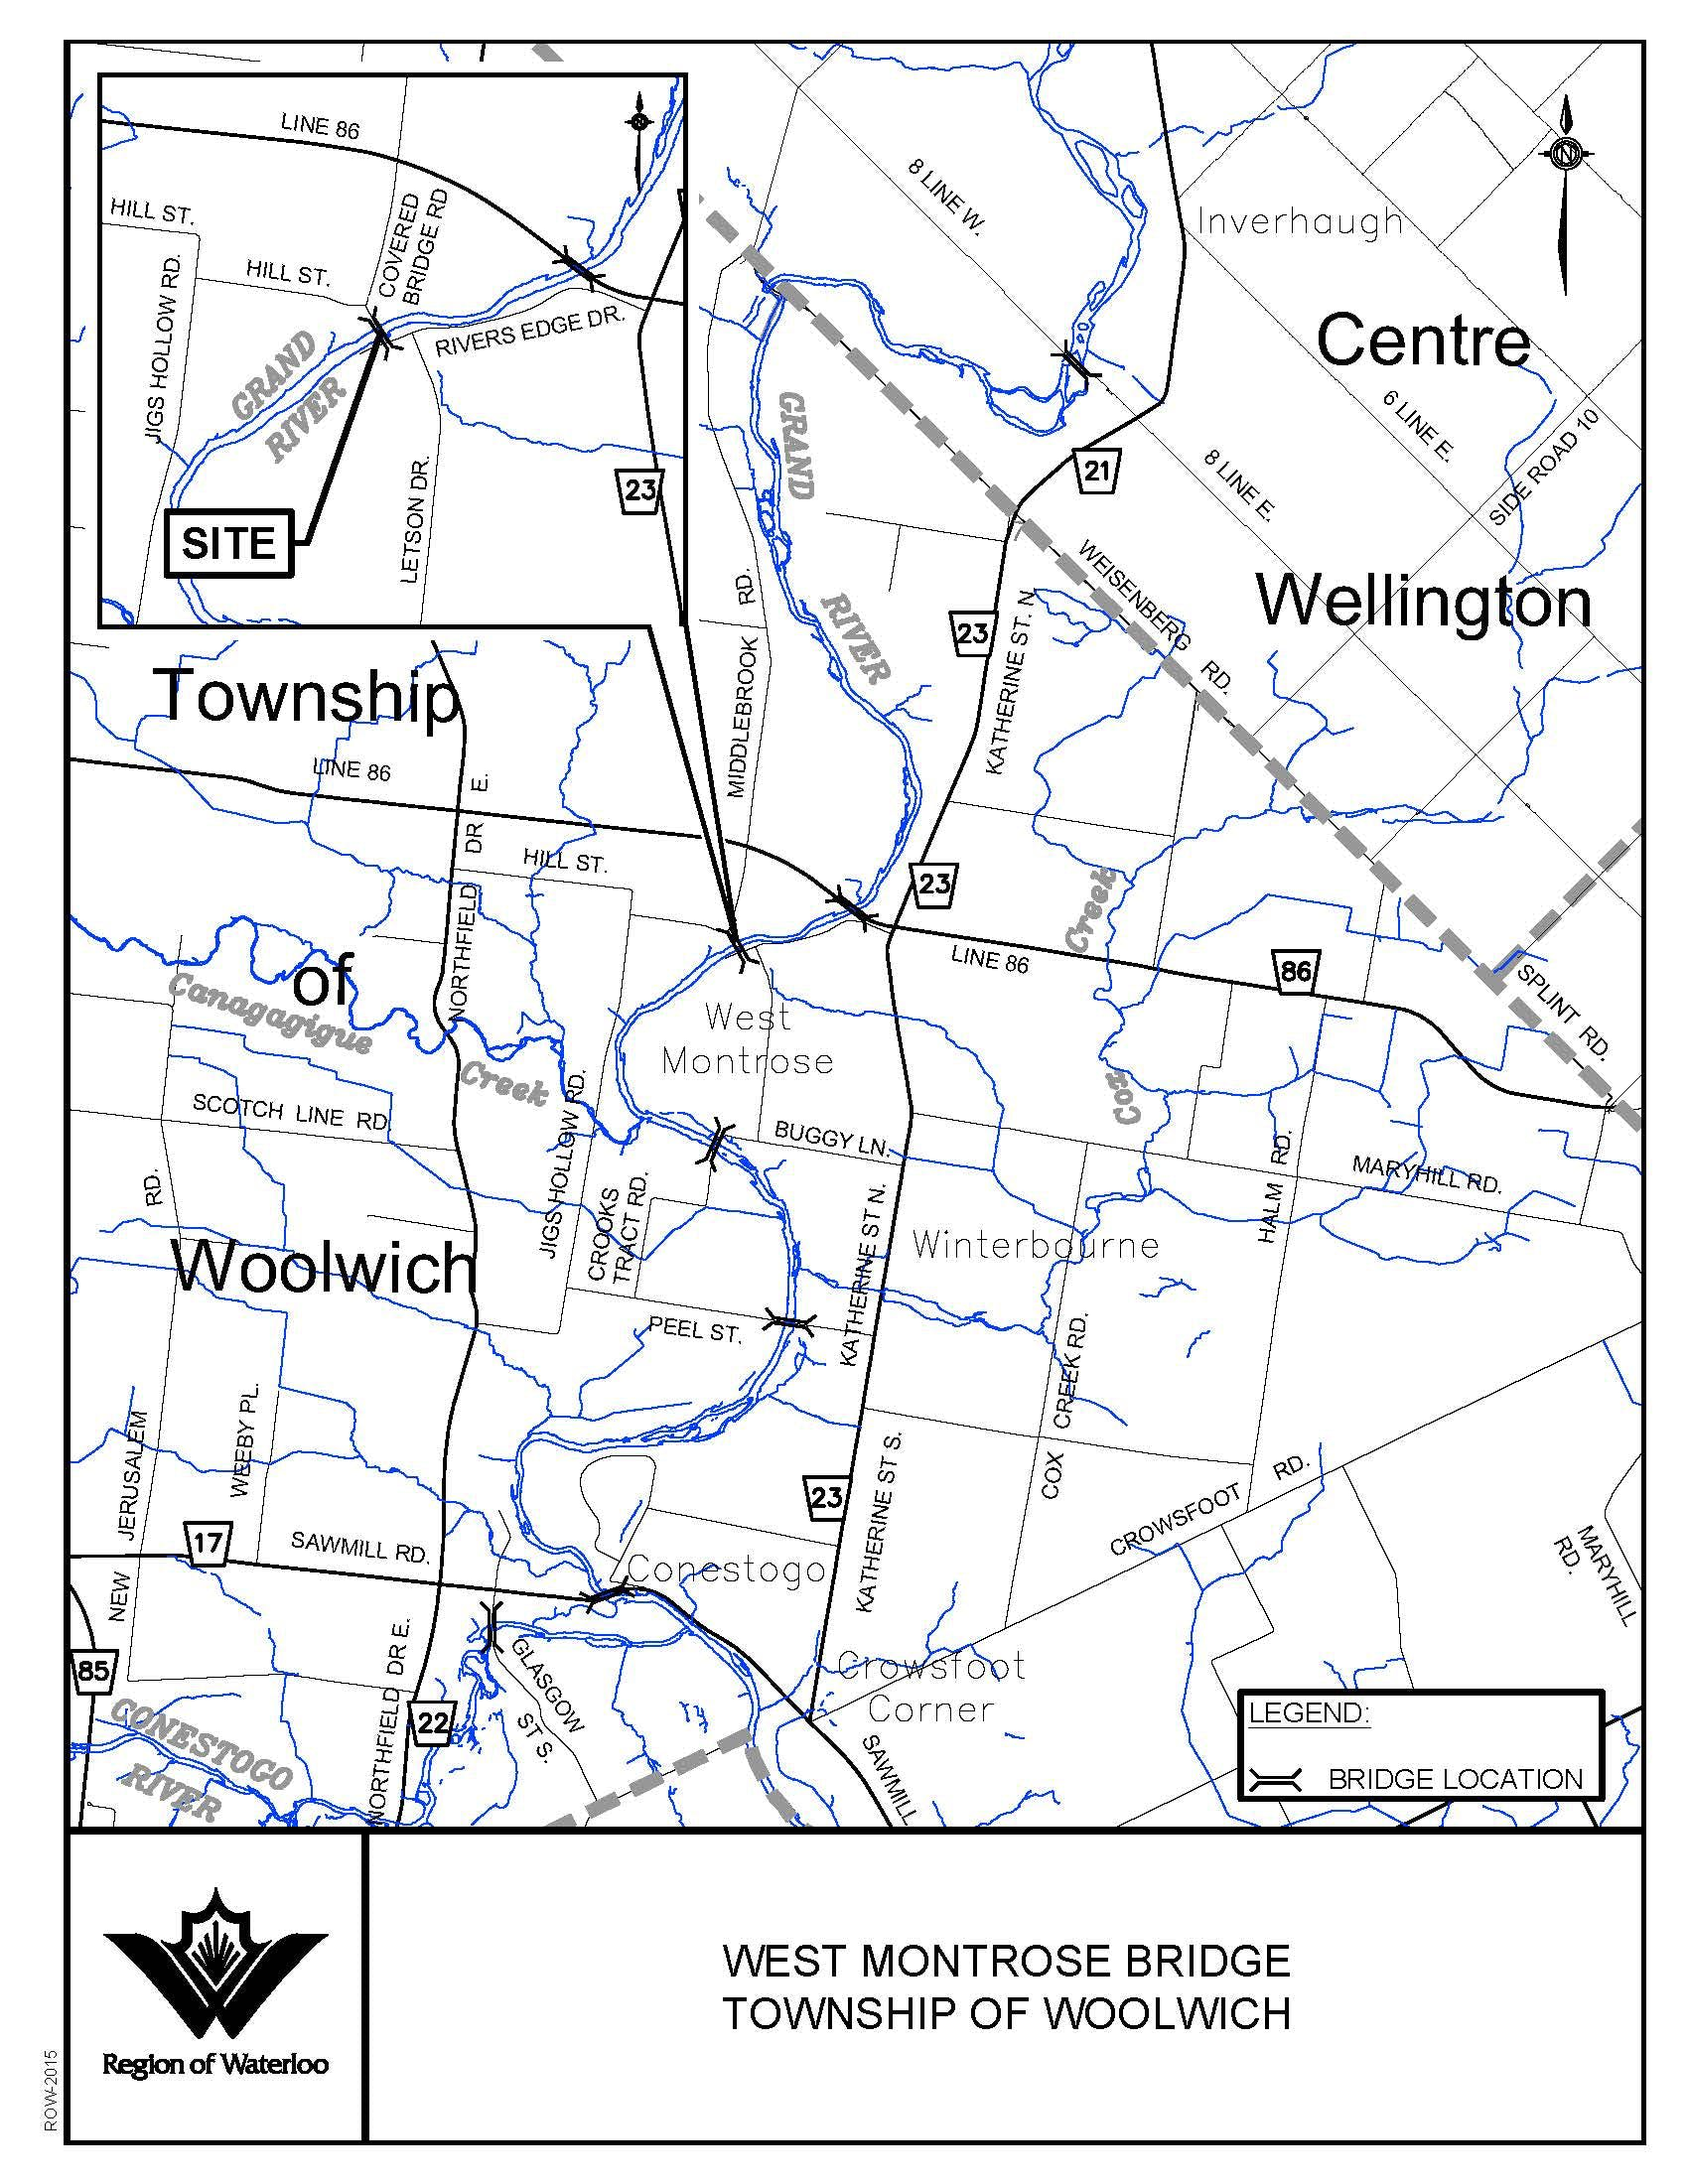 West Montrose Bridge - Key Plan